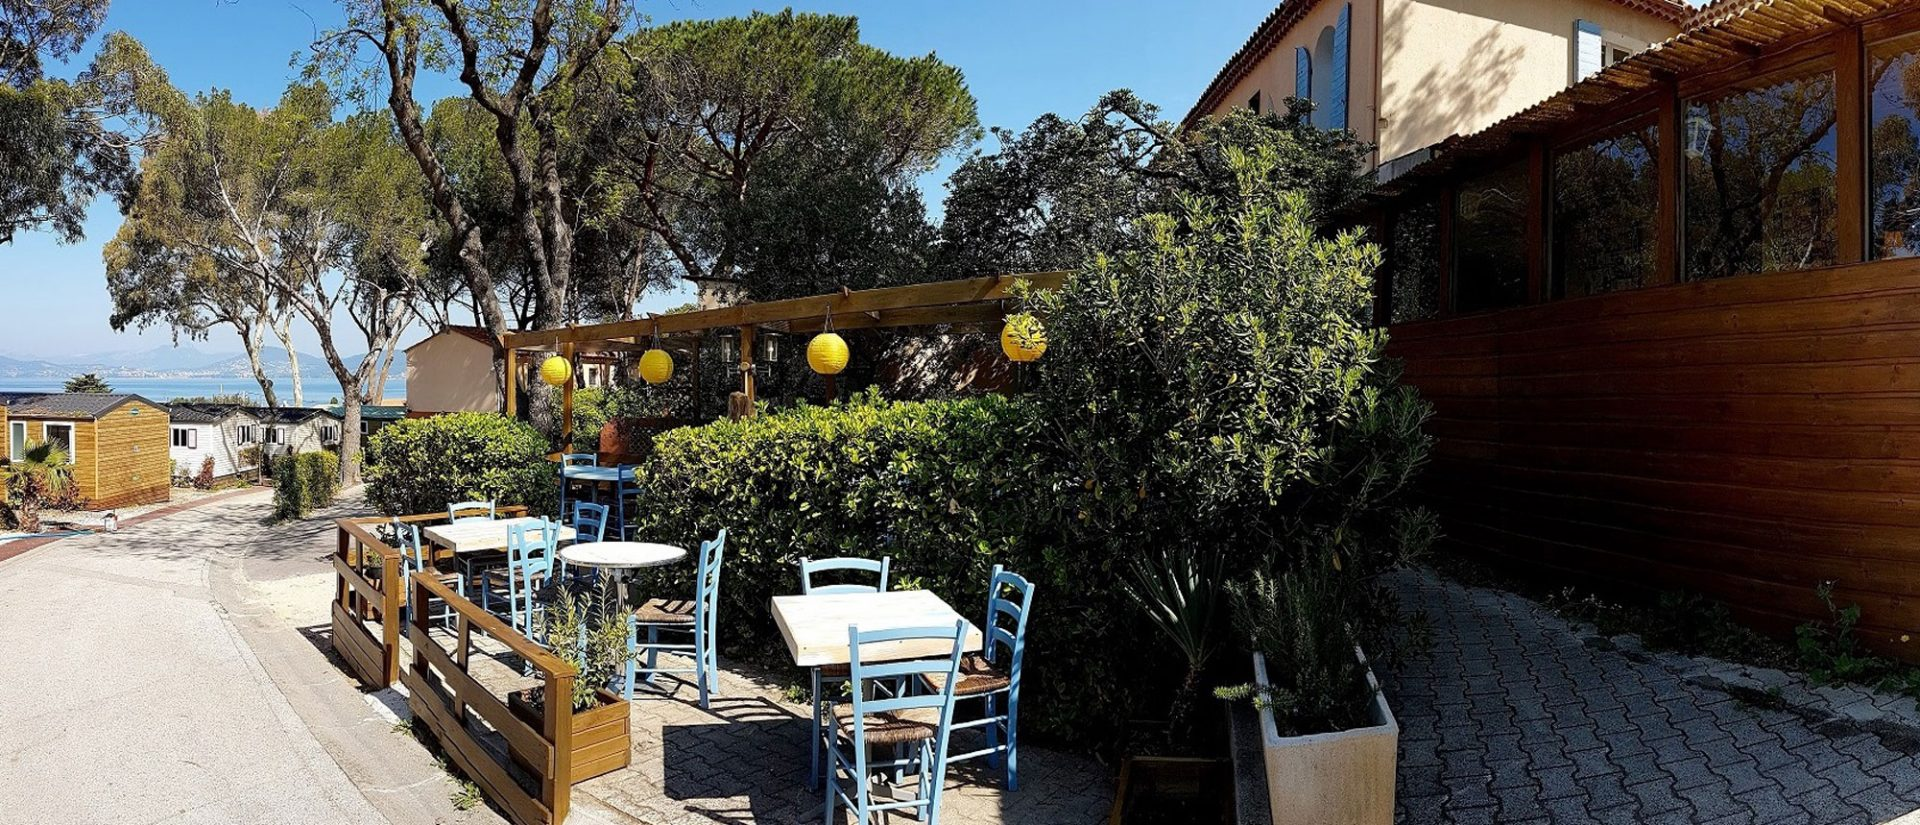 Clair De Lune : Restaurant Camping Vue Mer Clairdelune Giens Hyeres Terrasse